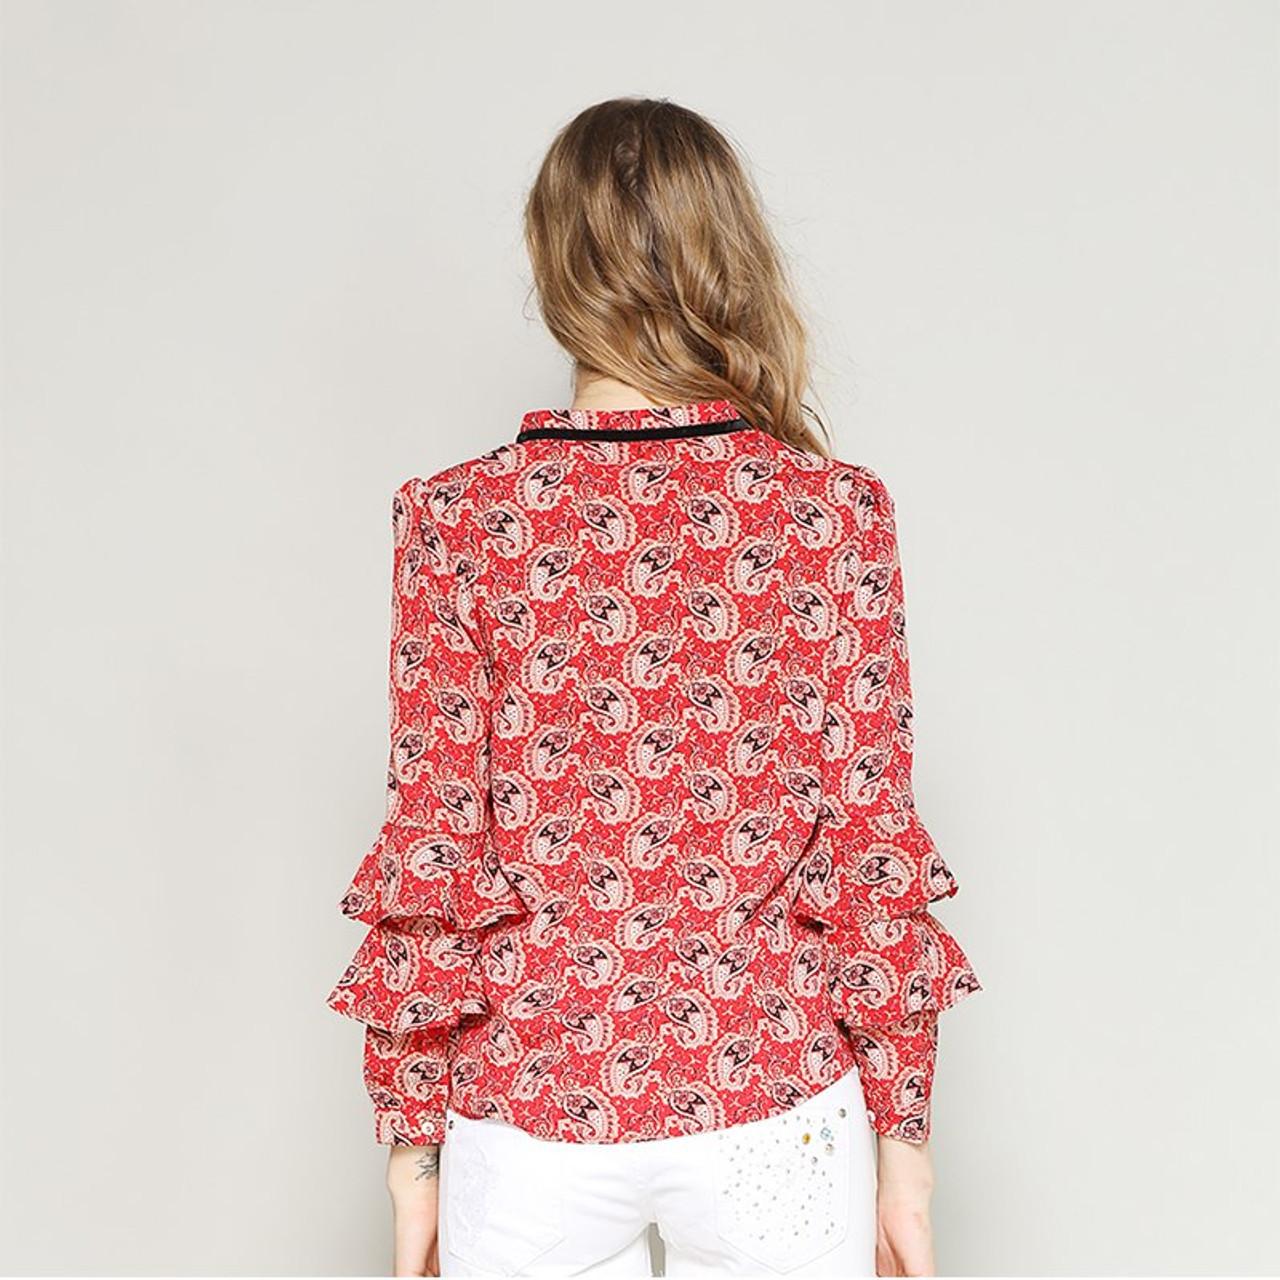 cdf2b7c55 ... nvyou gou Spring Summer Elegant Long Sleeve Ruffle Layer Chiffon Blouse  Women Vintage Floral Print Fashion ...